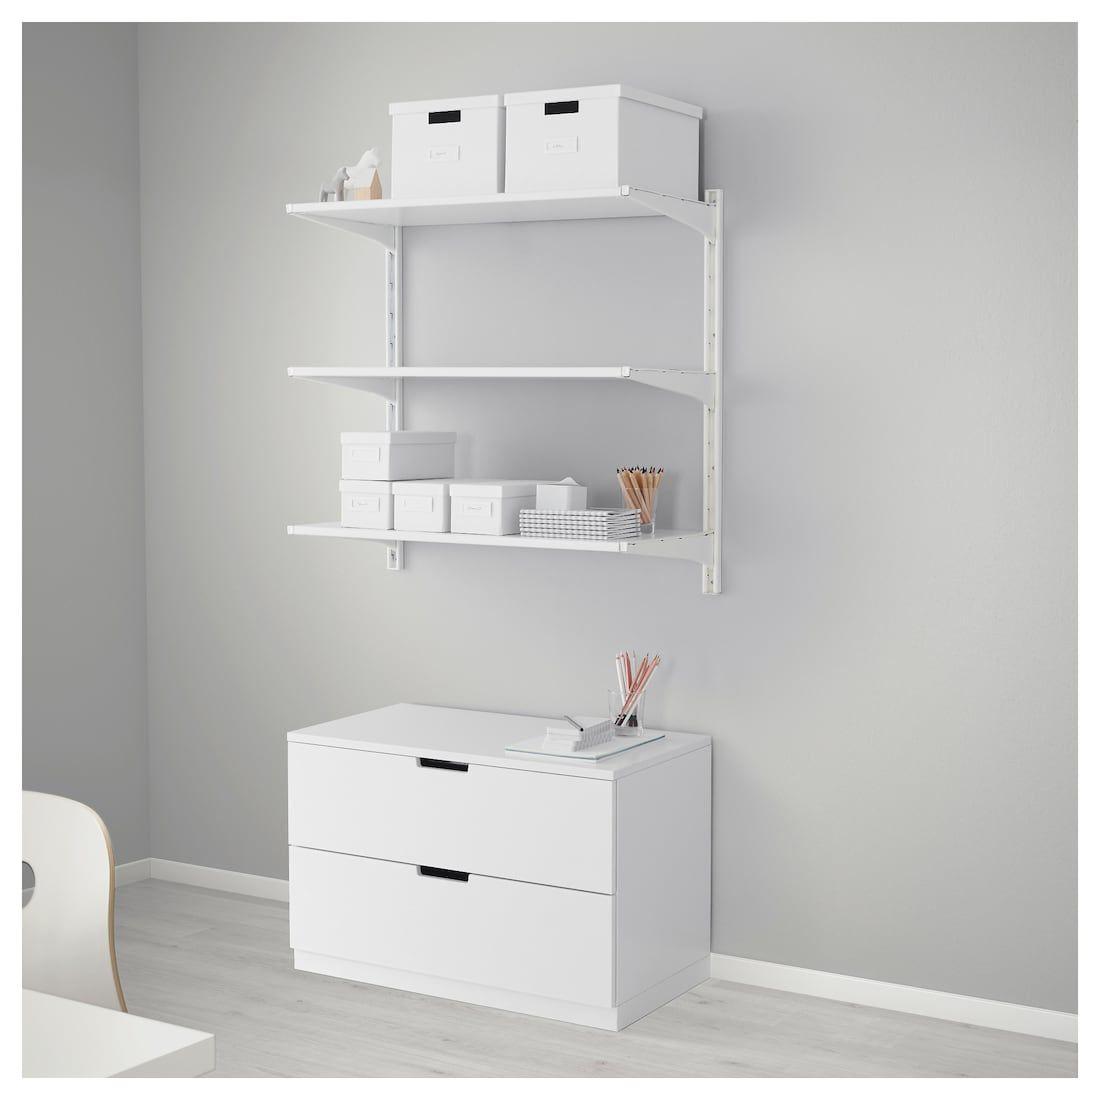 Algot Wall Upright Shelves White 33 7 8x16 1 8x33 1 2 Ikea